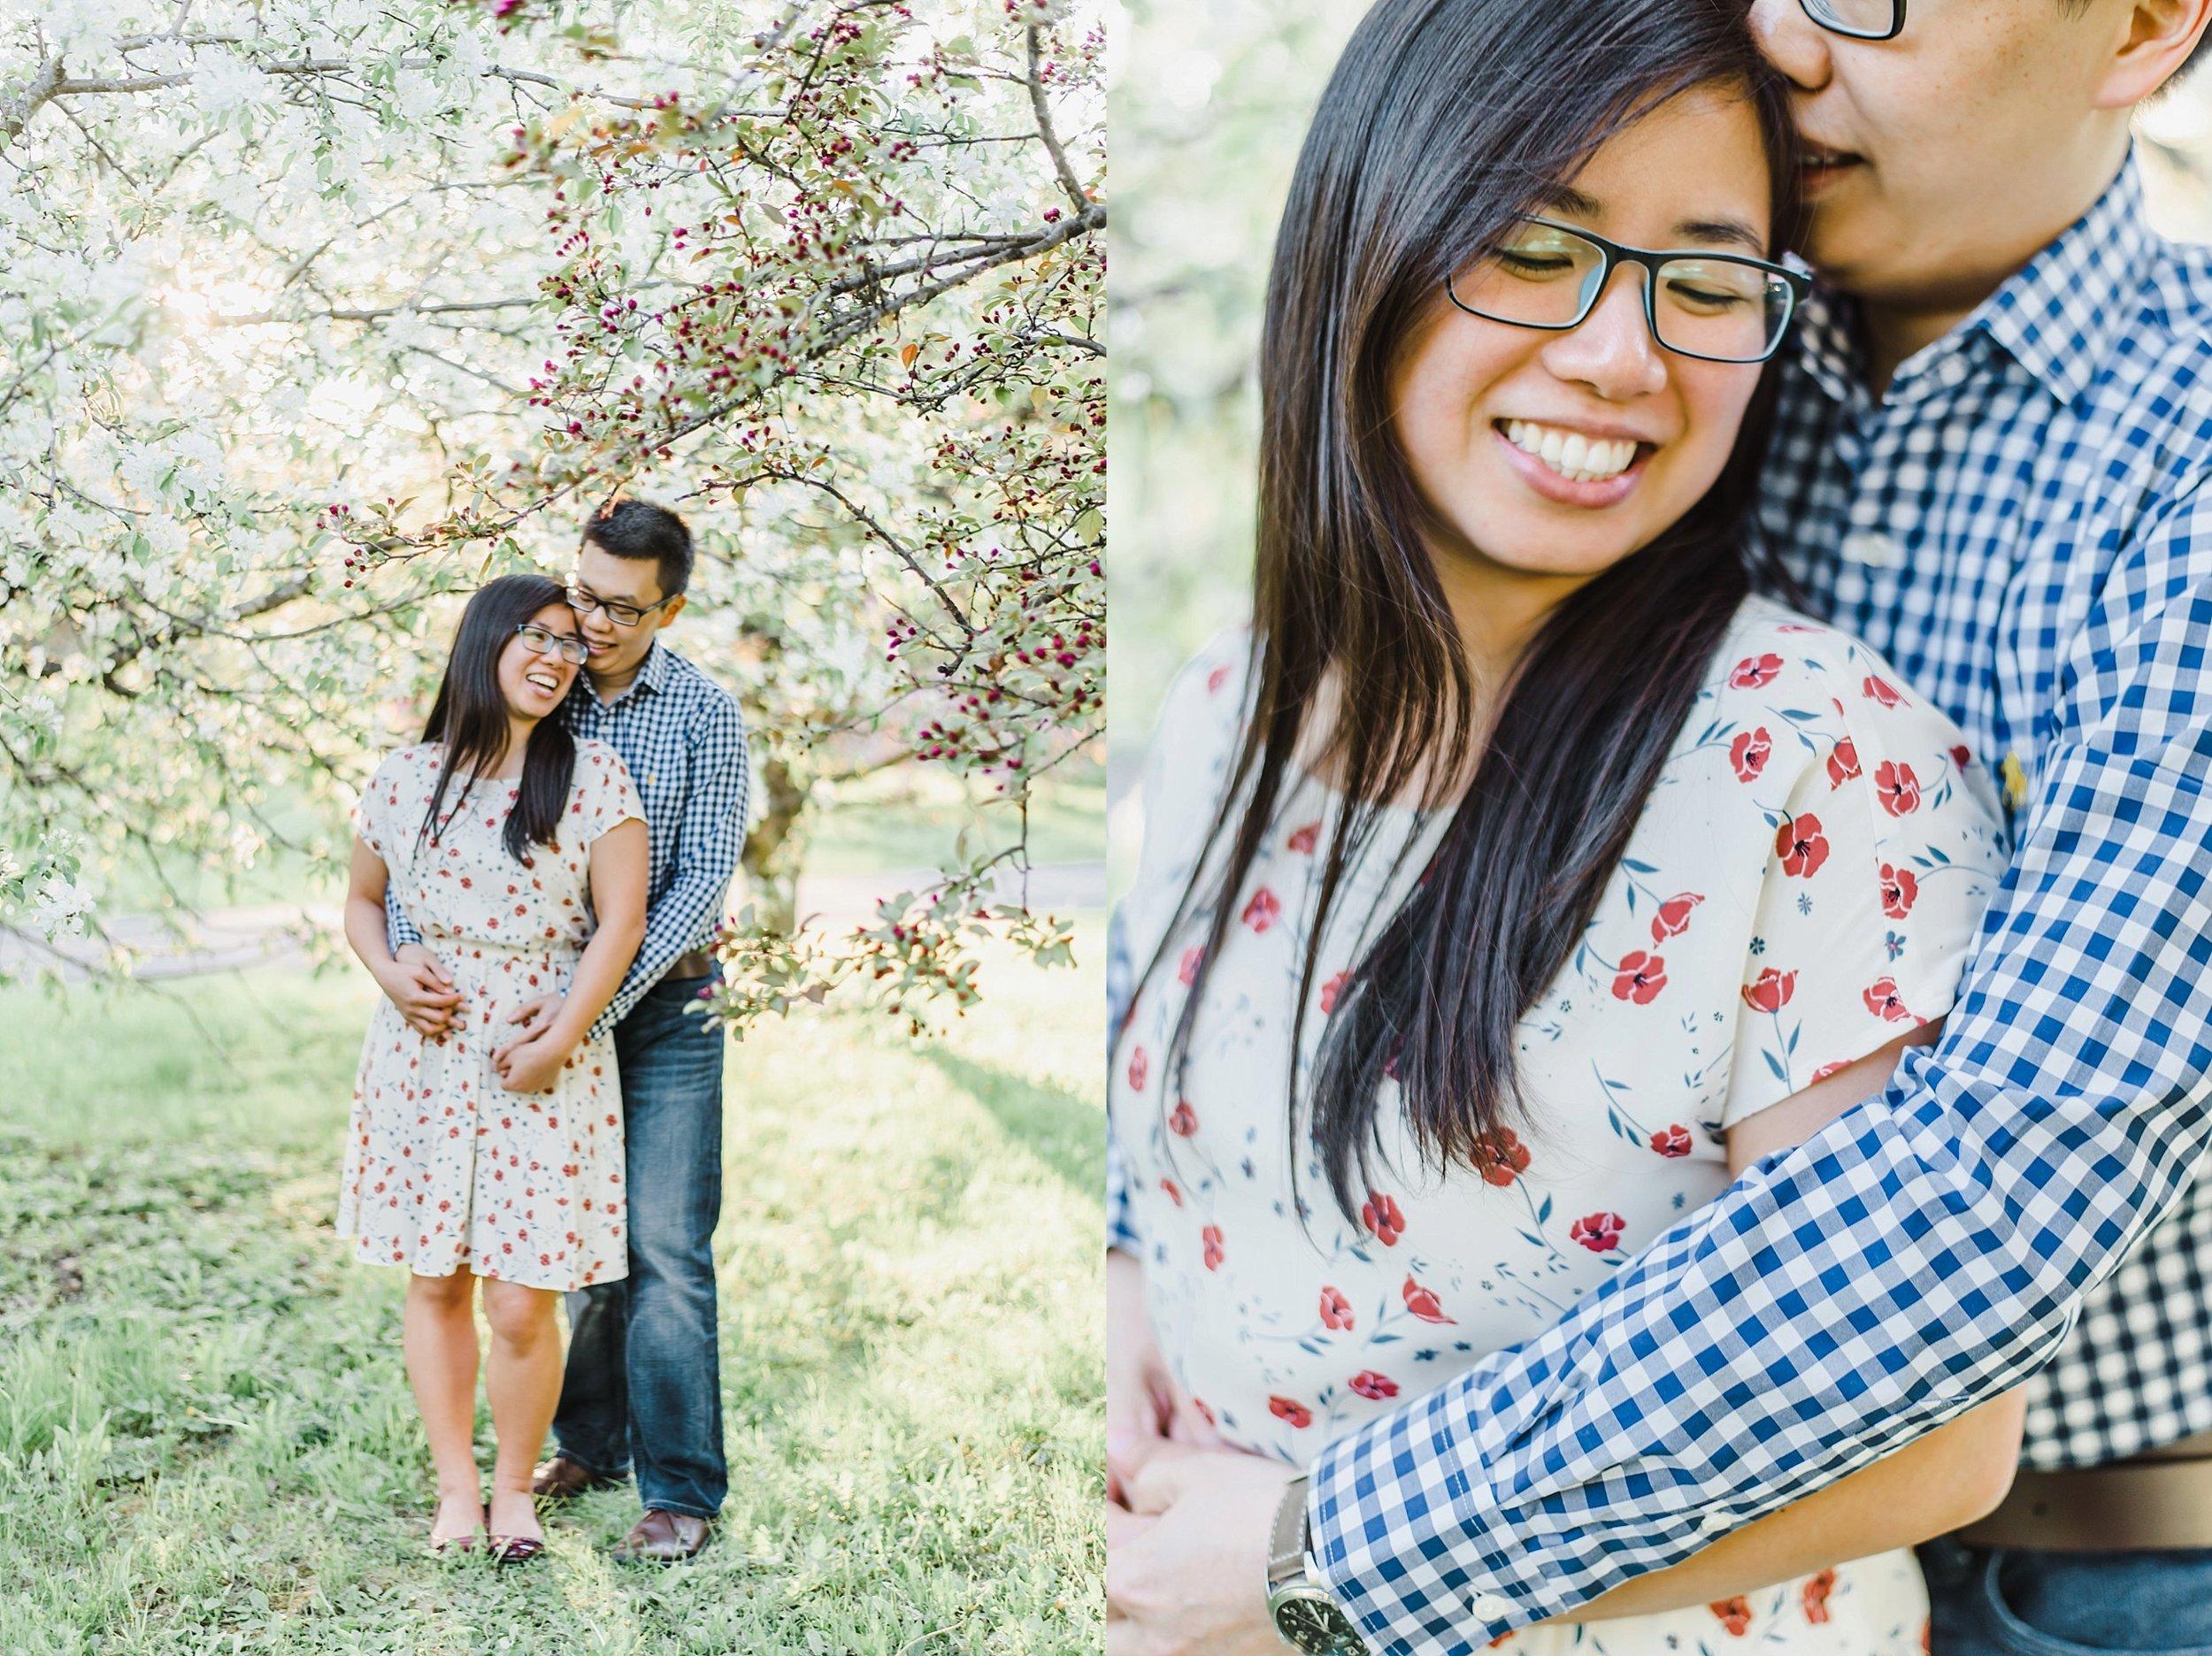 light airy indie fine art ottawa wedding photographer | Ali and Batoul Photography_0015.jpg